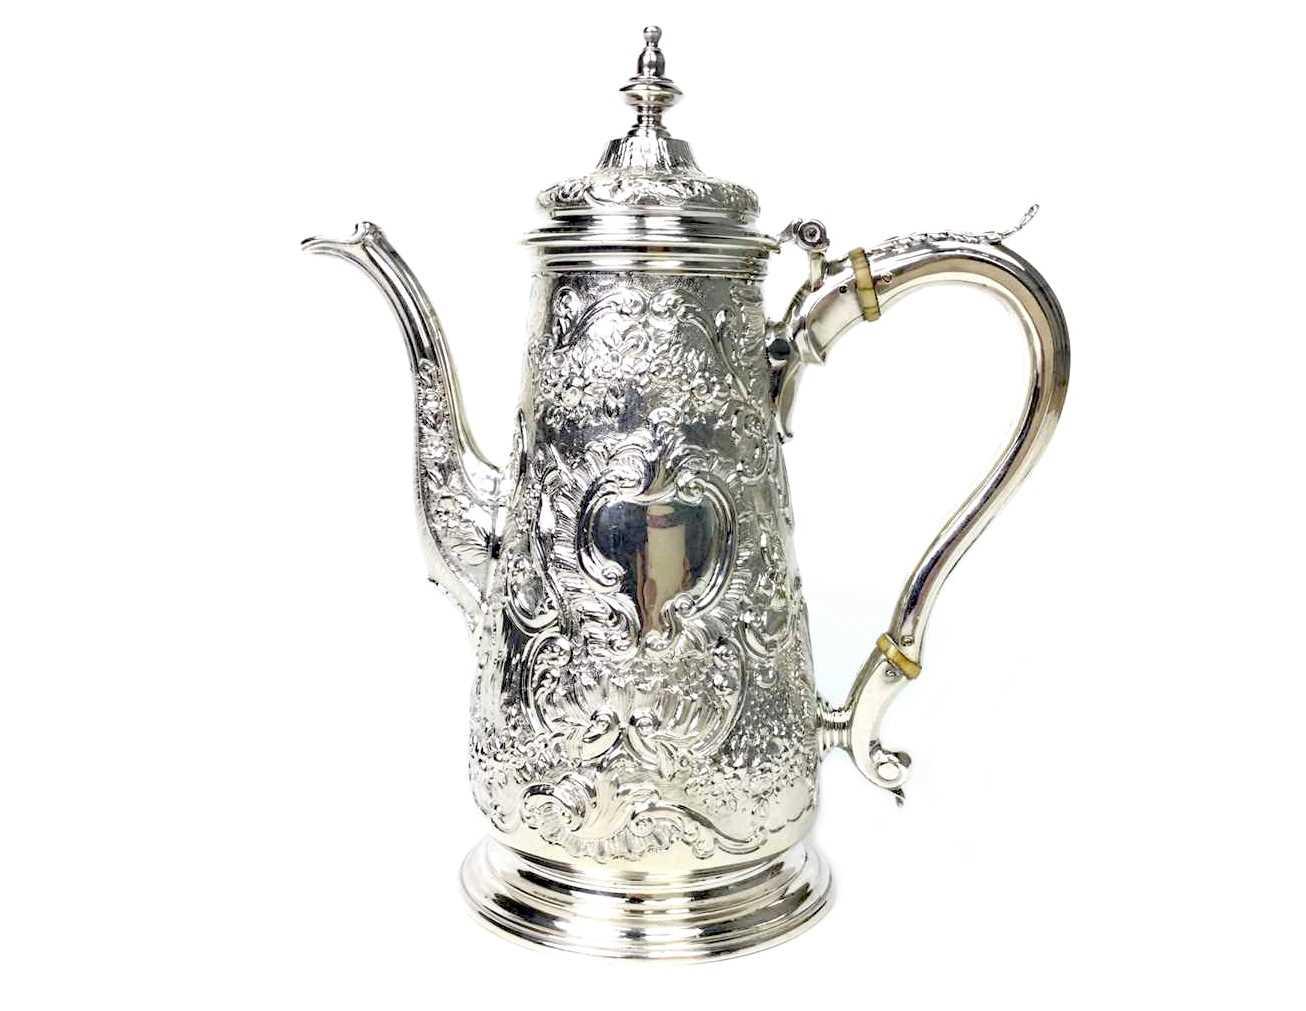 Lot 939 - A GEORGE III SILVER COFFEE POT